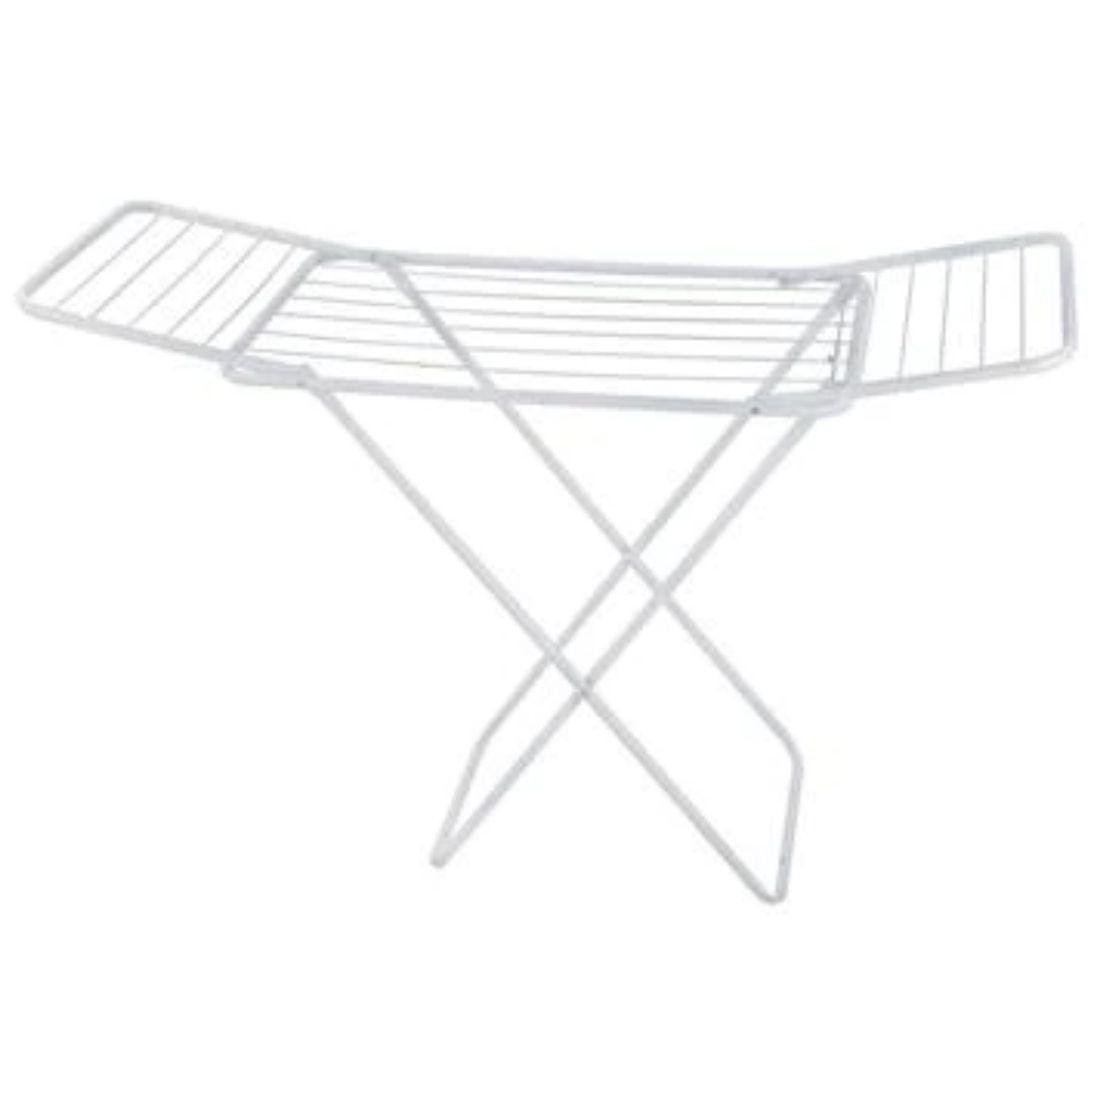 Varal de Chão Dobrável com Abas 1,40 Branco